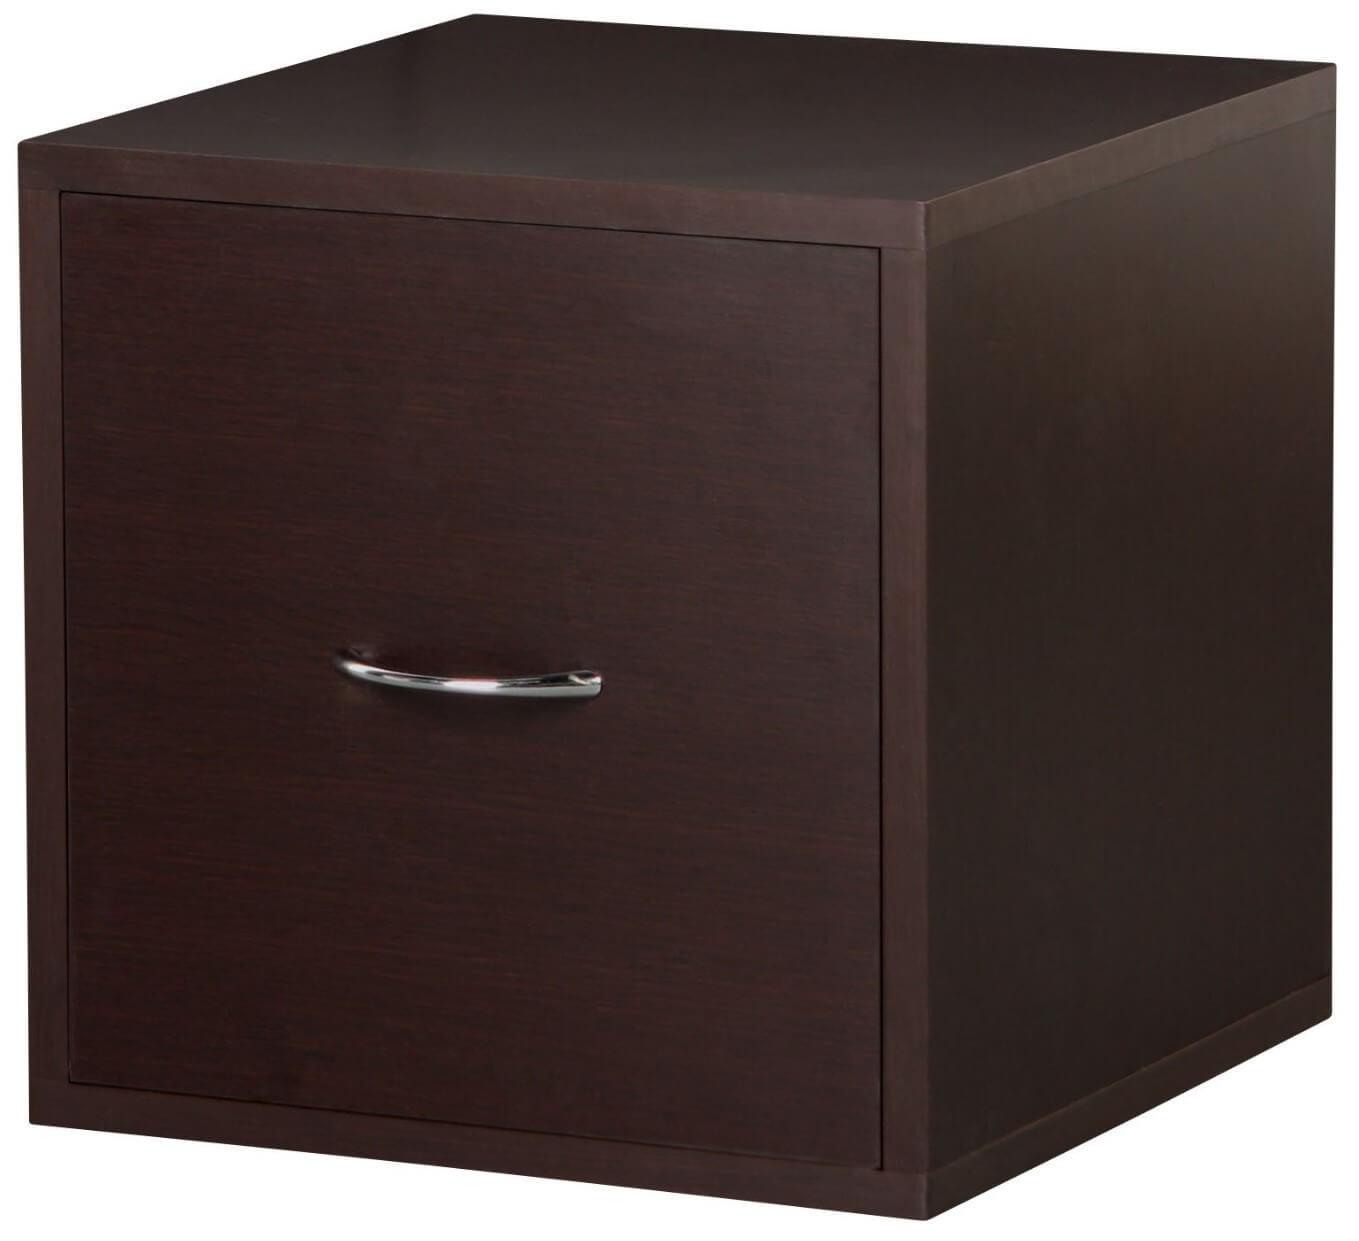 Wood single drawer cube filing cabinet